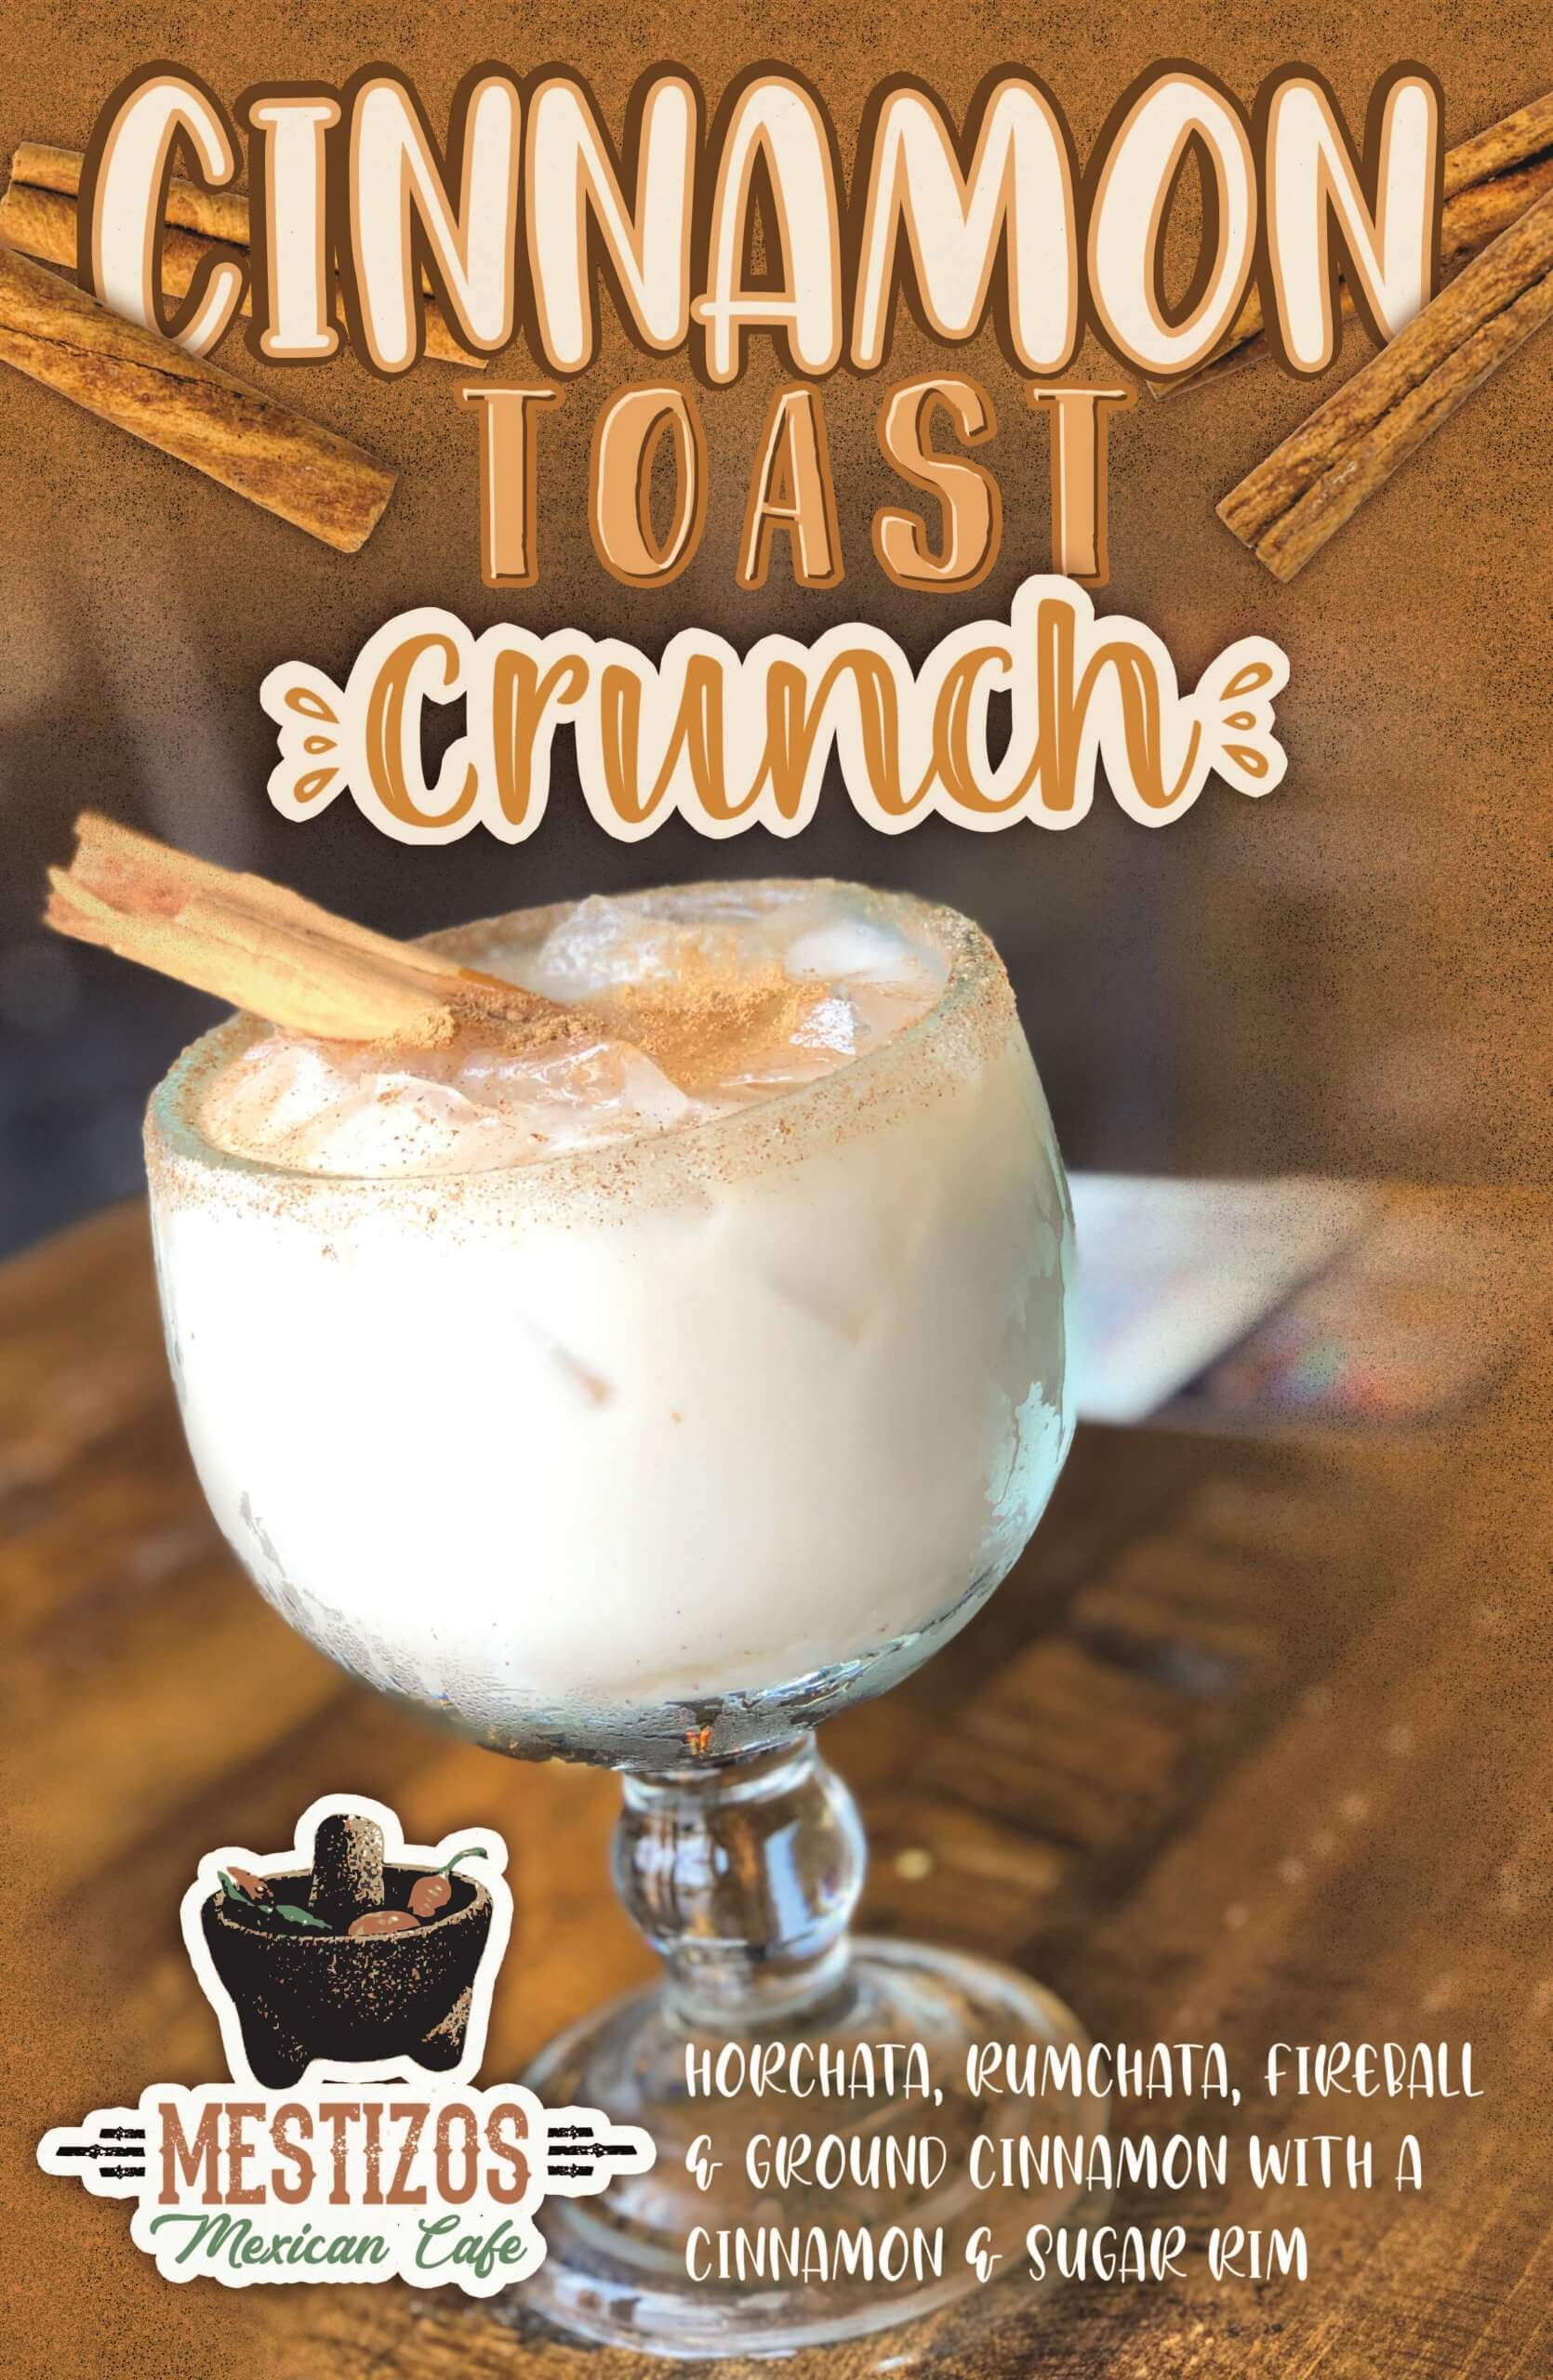 Cinnamon Toast Crunch 11x17